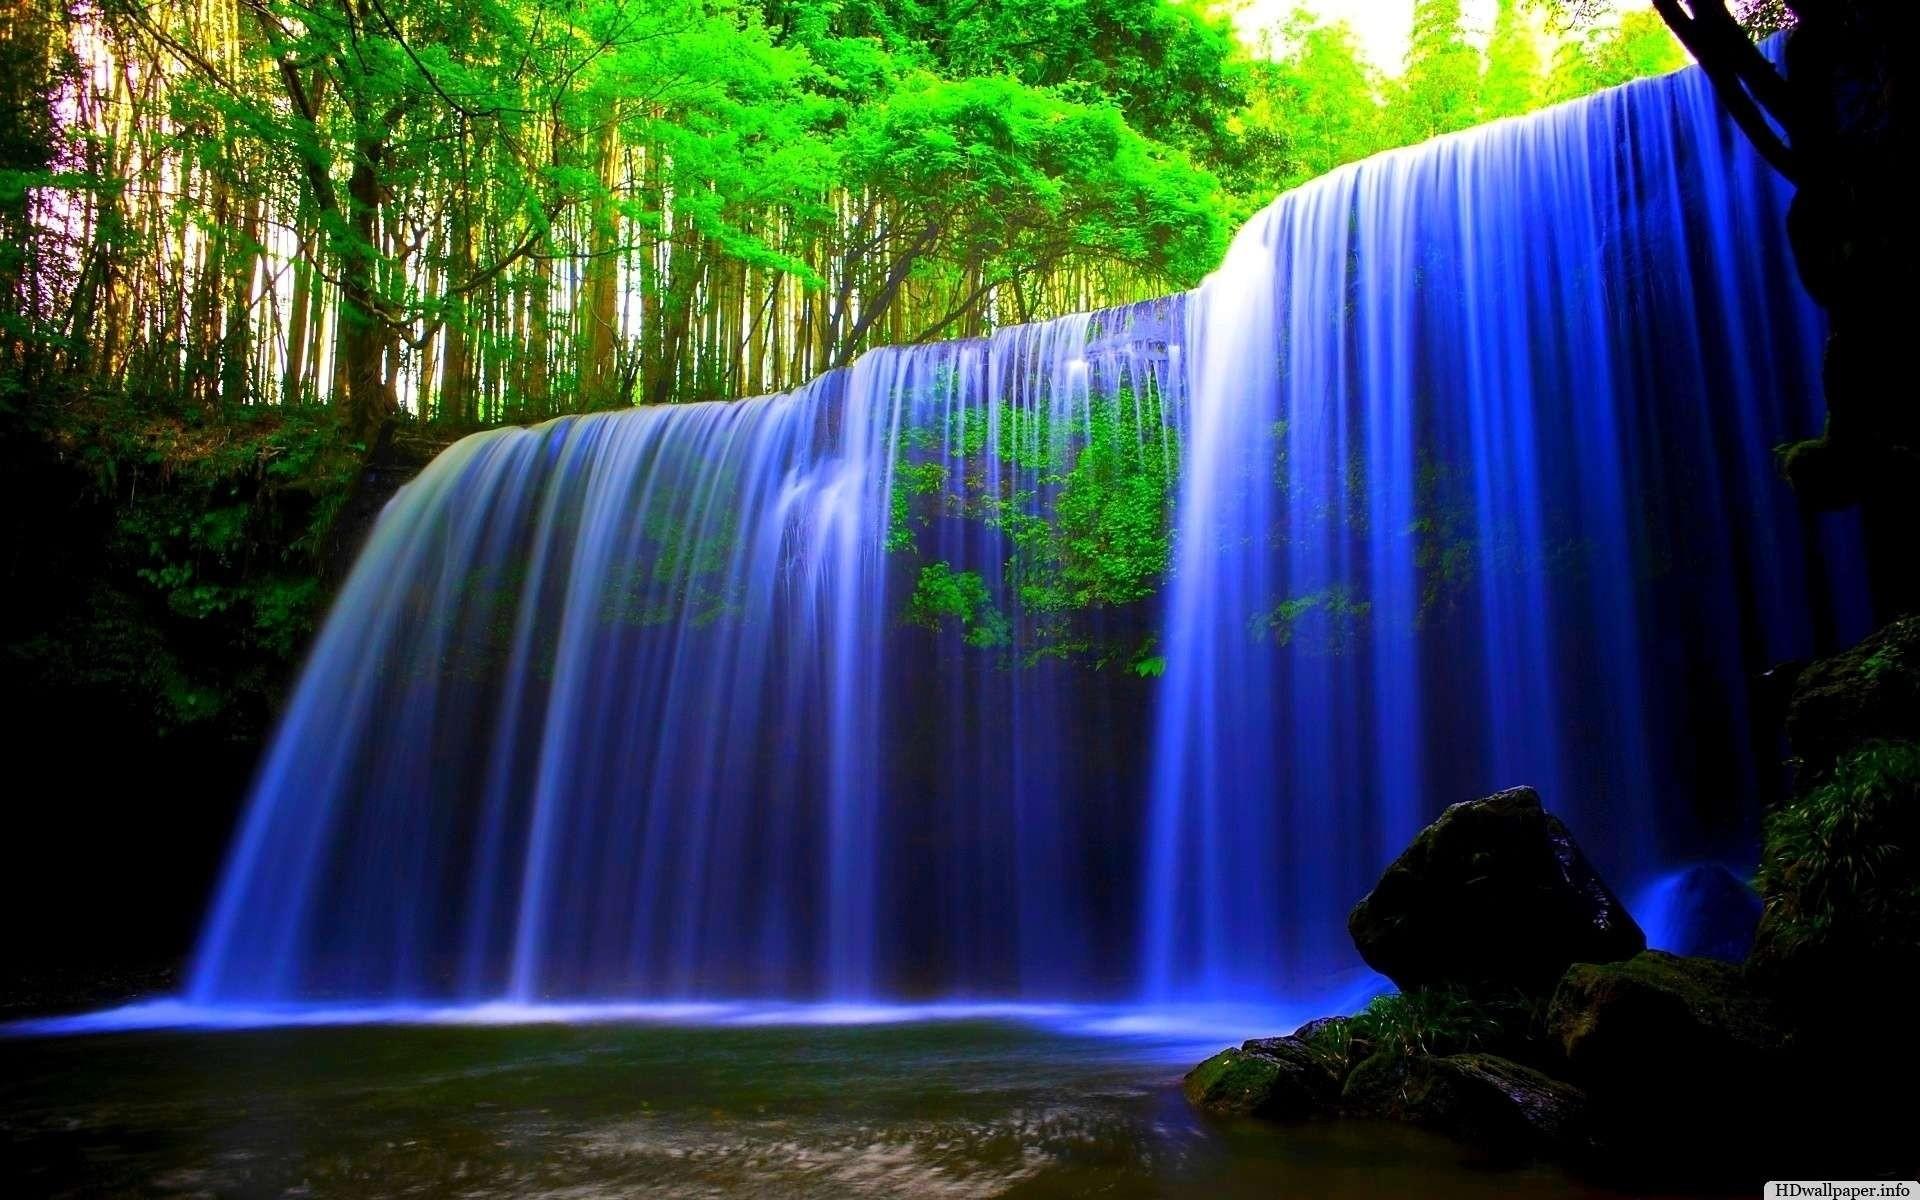 Download Hd Waterfall 3d Live Wallpaper Gallery 3D Live Wallpaper